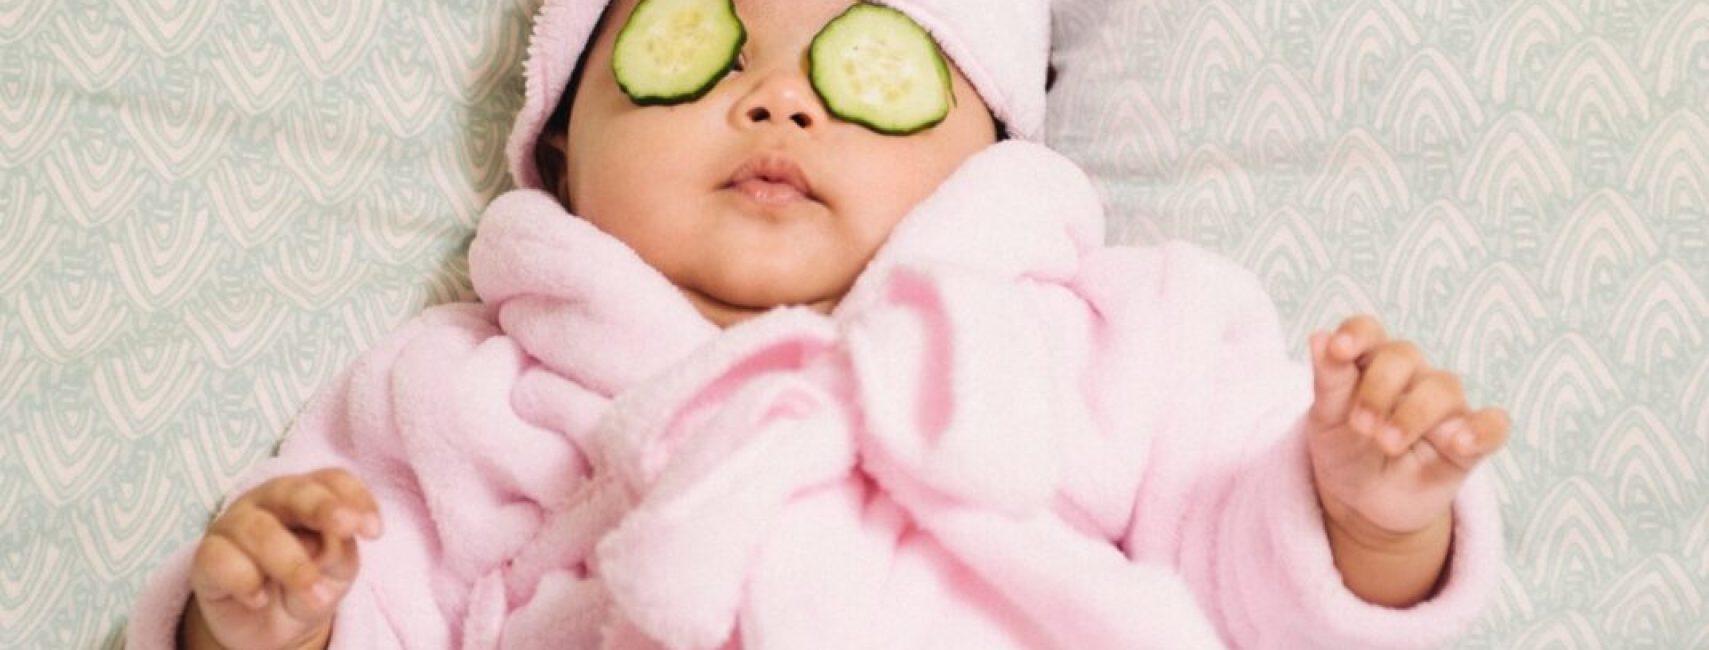 how do I get my baby to sleep at night